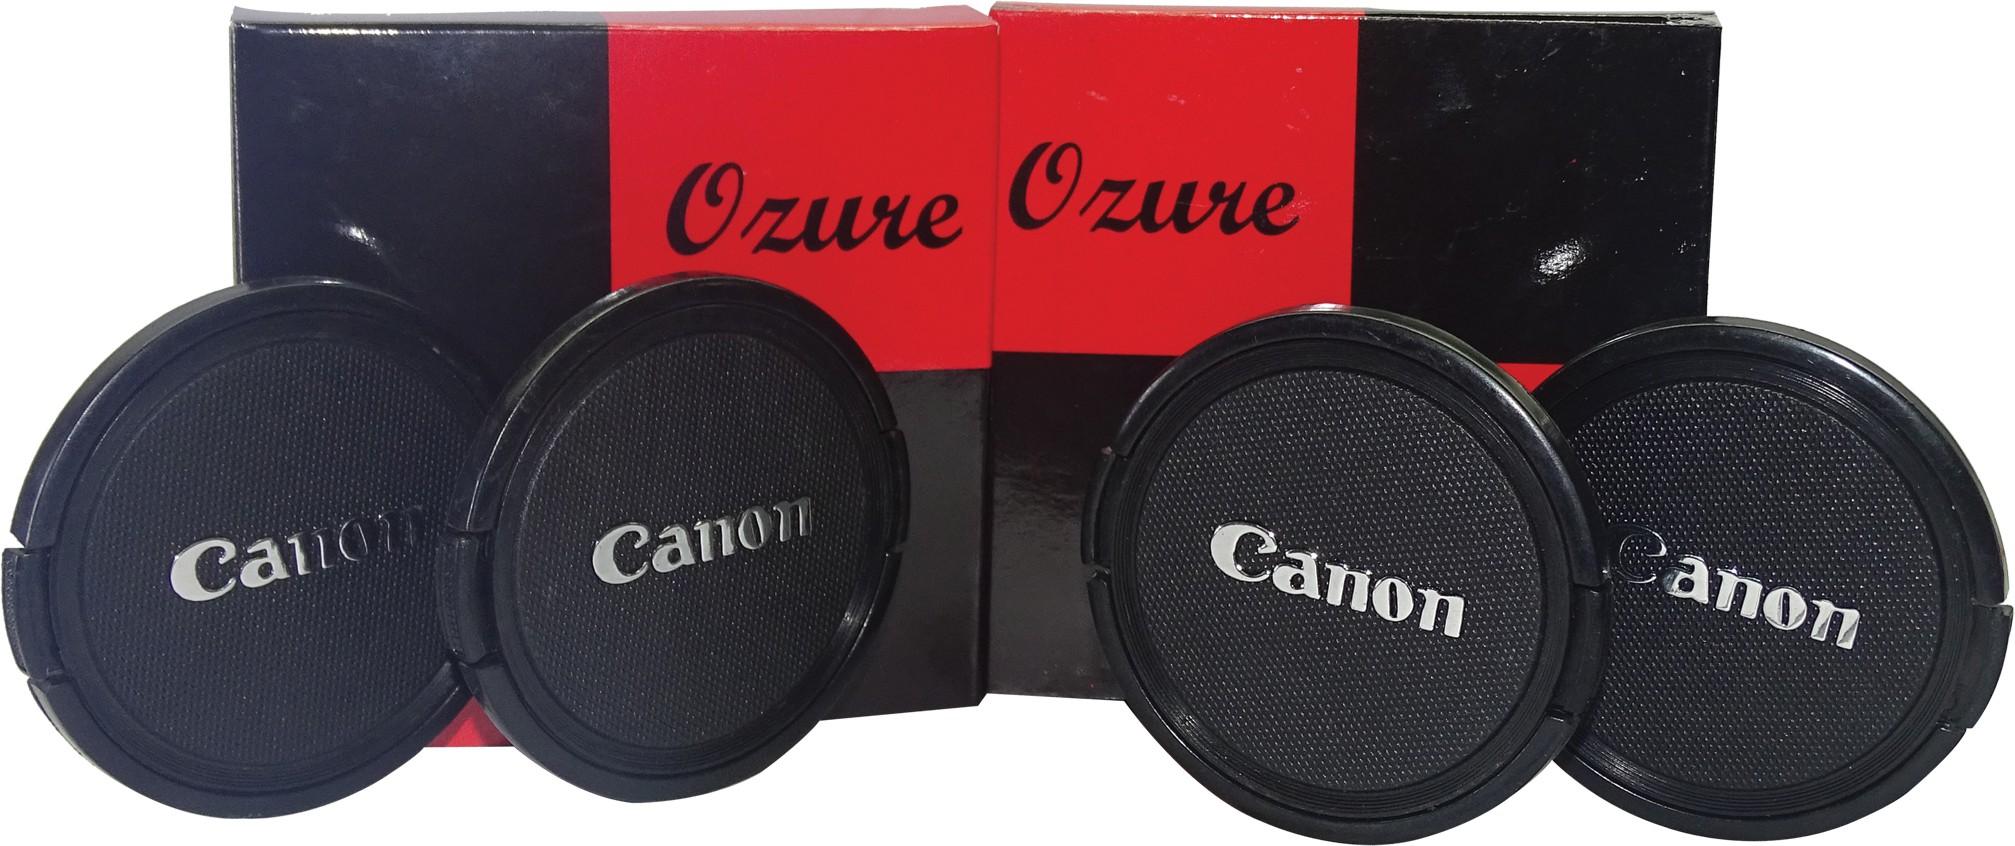 Ozure SECLCC67B  Lens Cap(Black + Silver Embossed, 67 mm)